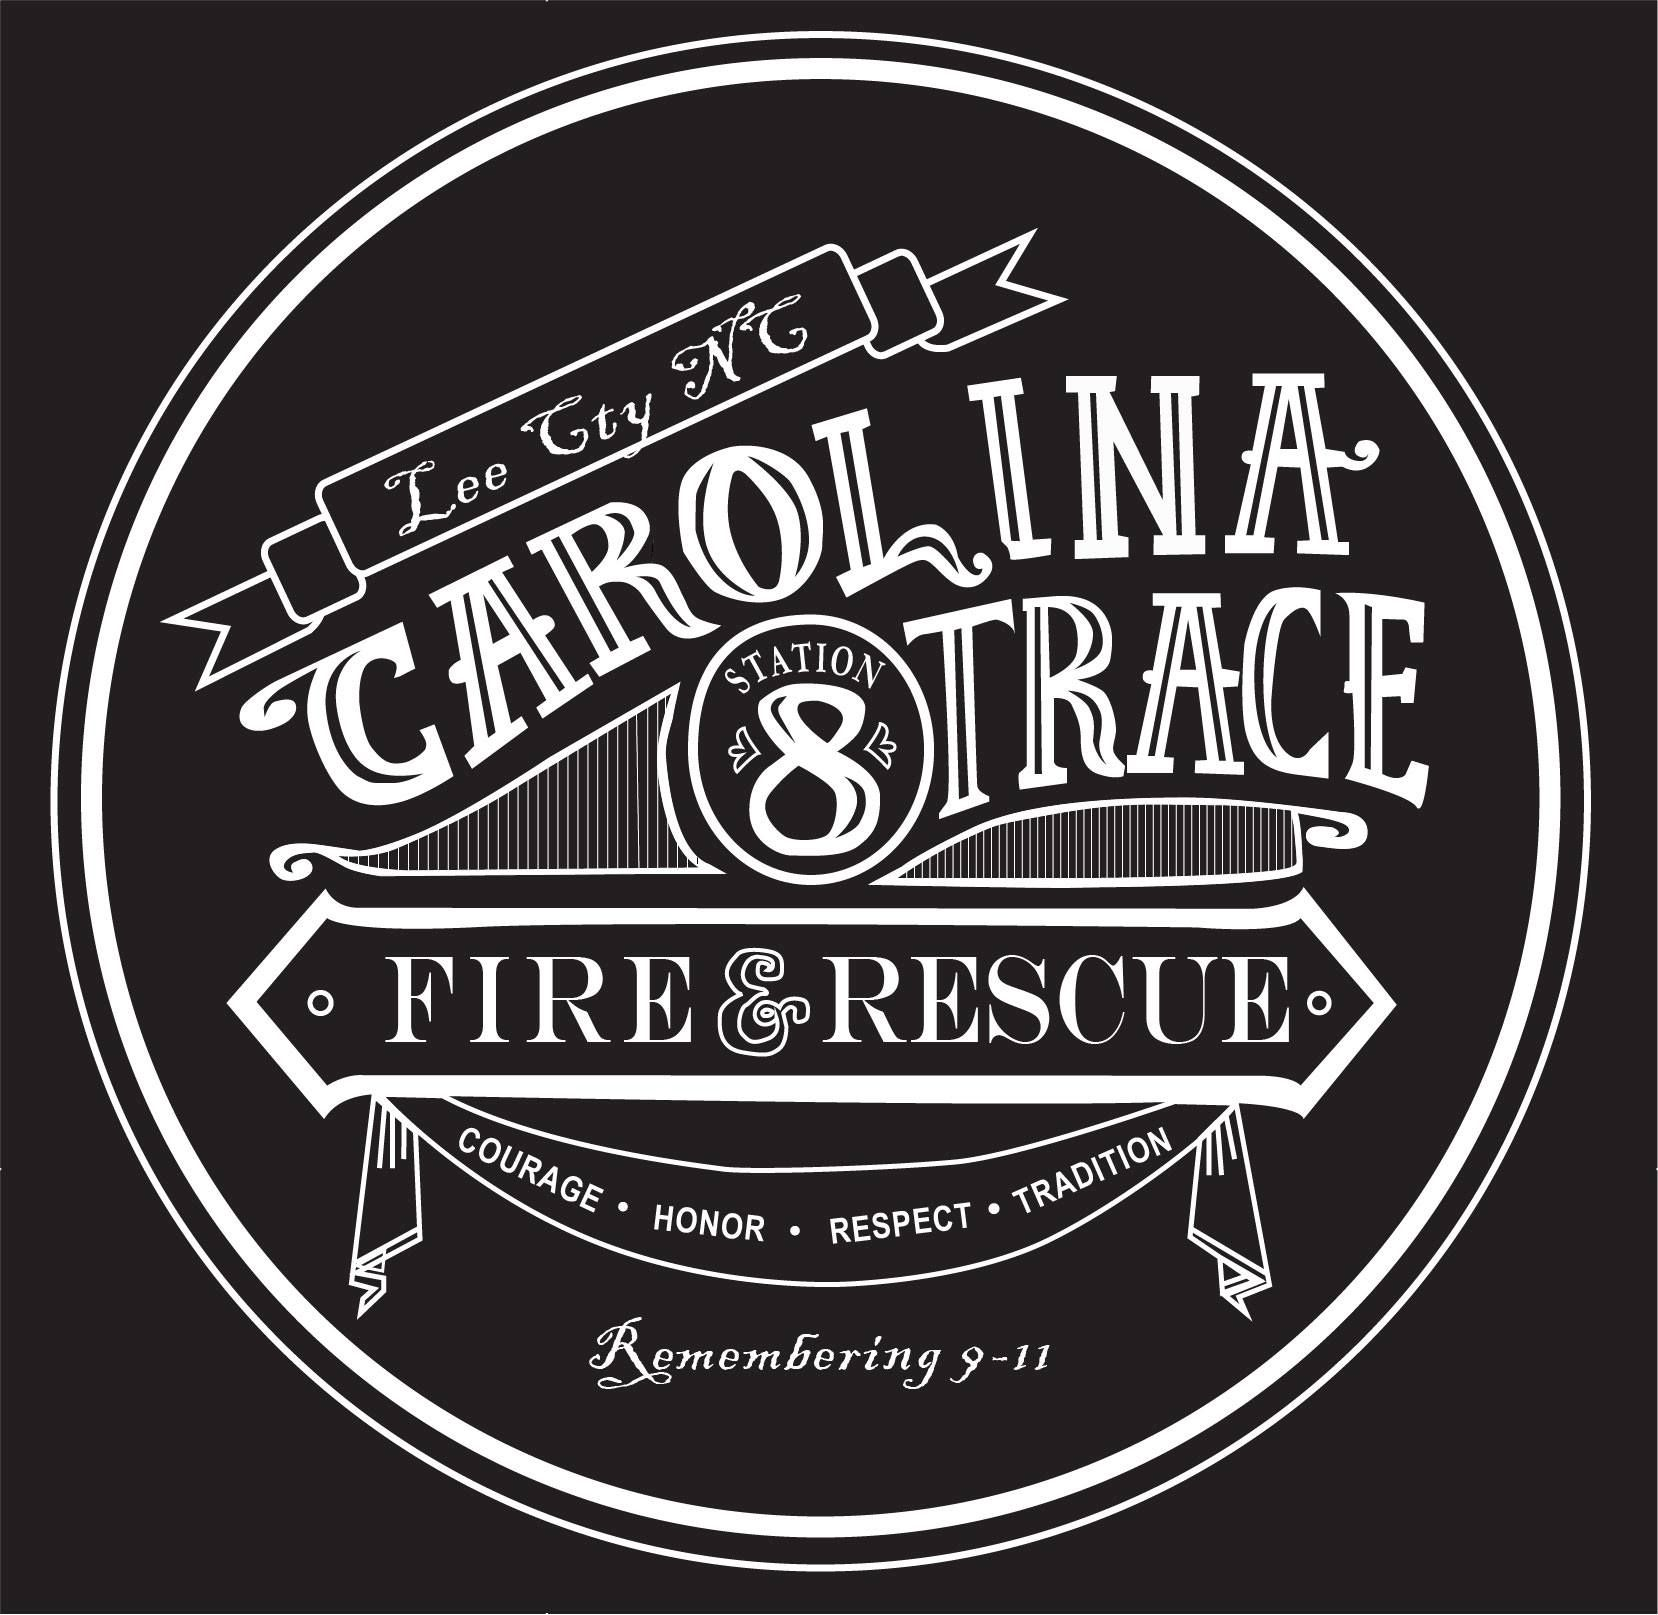 Hand drawn Logo design for Carolina Trace FD, sanford, nc